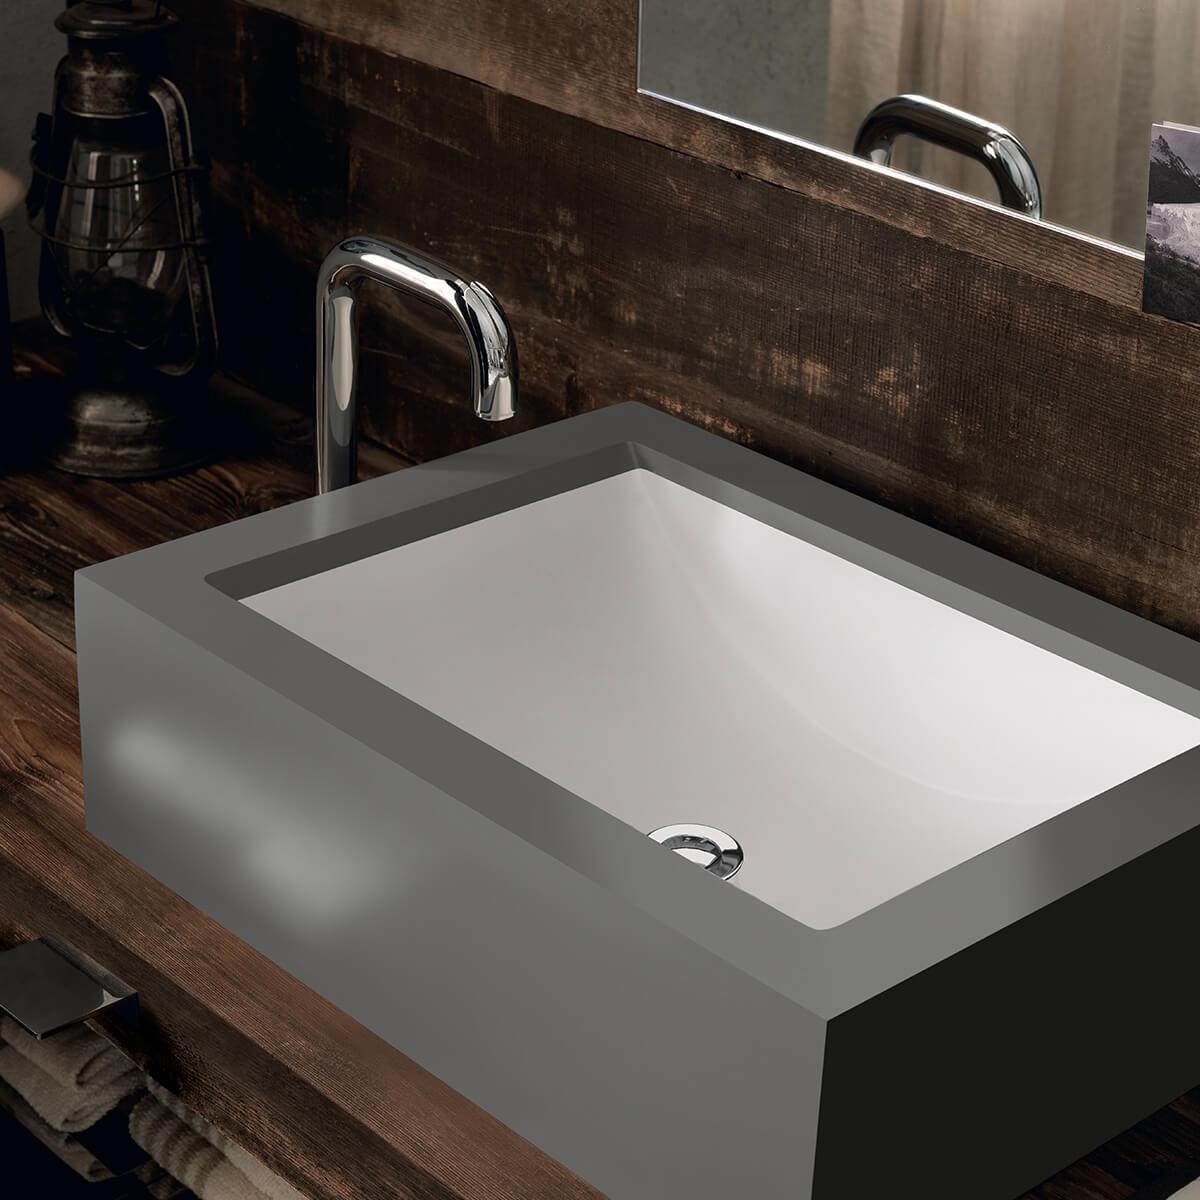 CASF corian basin refresh 8410 bathroom